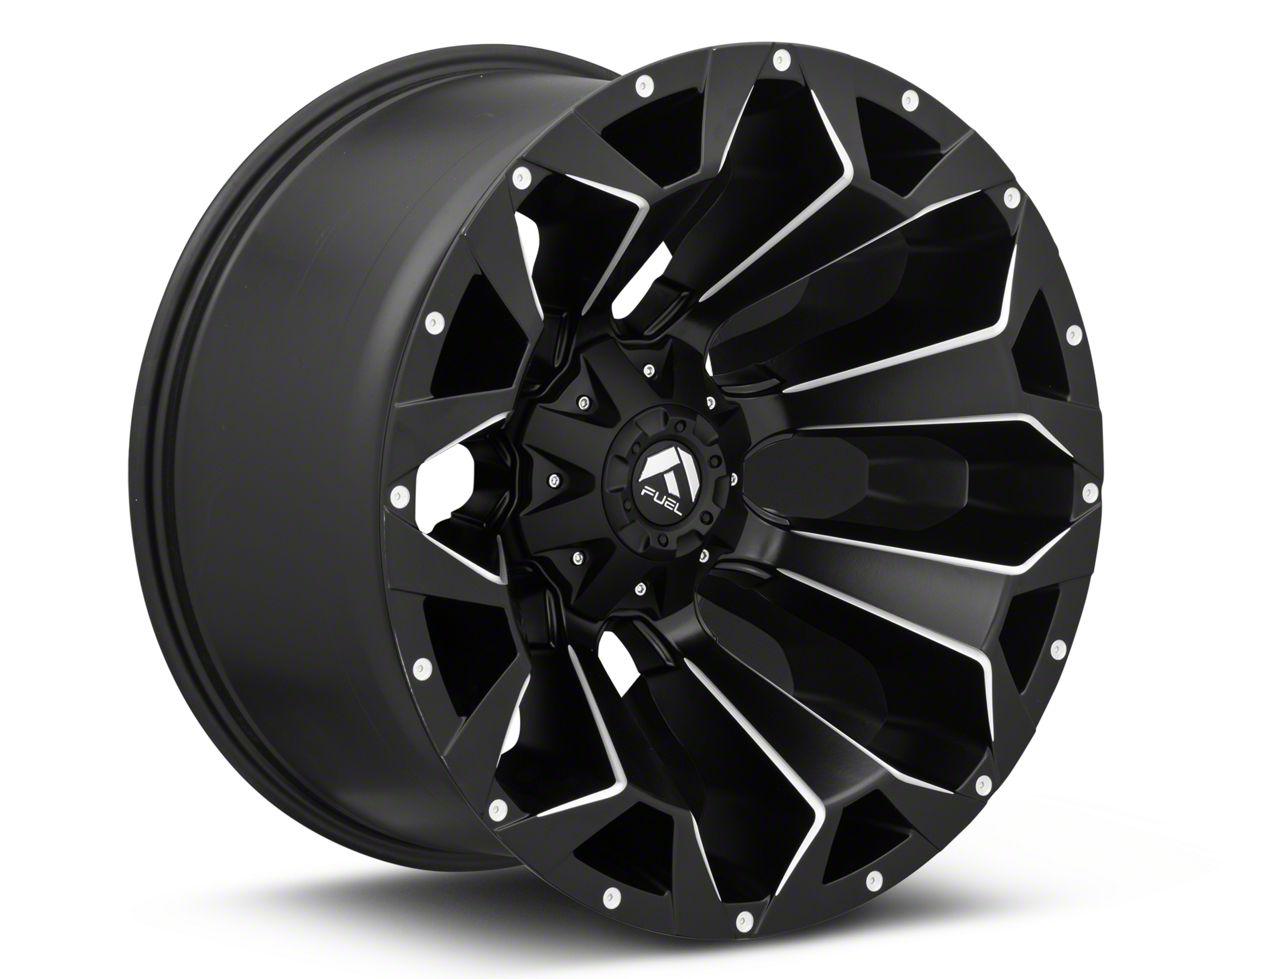 Fuel Wheels Assault Black Miled 6-Lug Wheel - 22x12 (07-18 Sierra 1500)